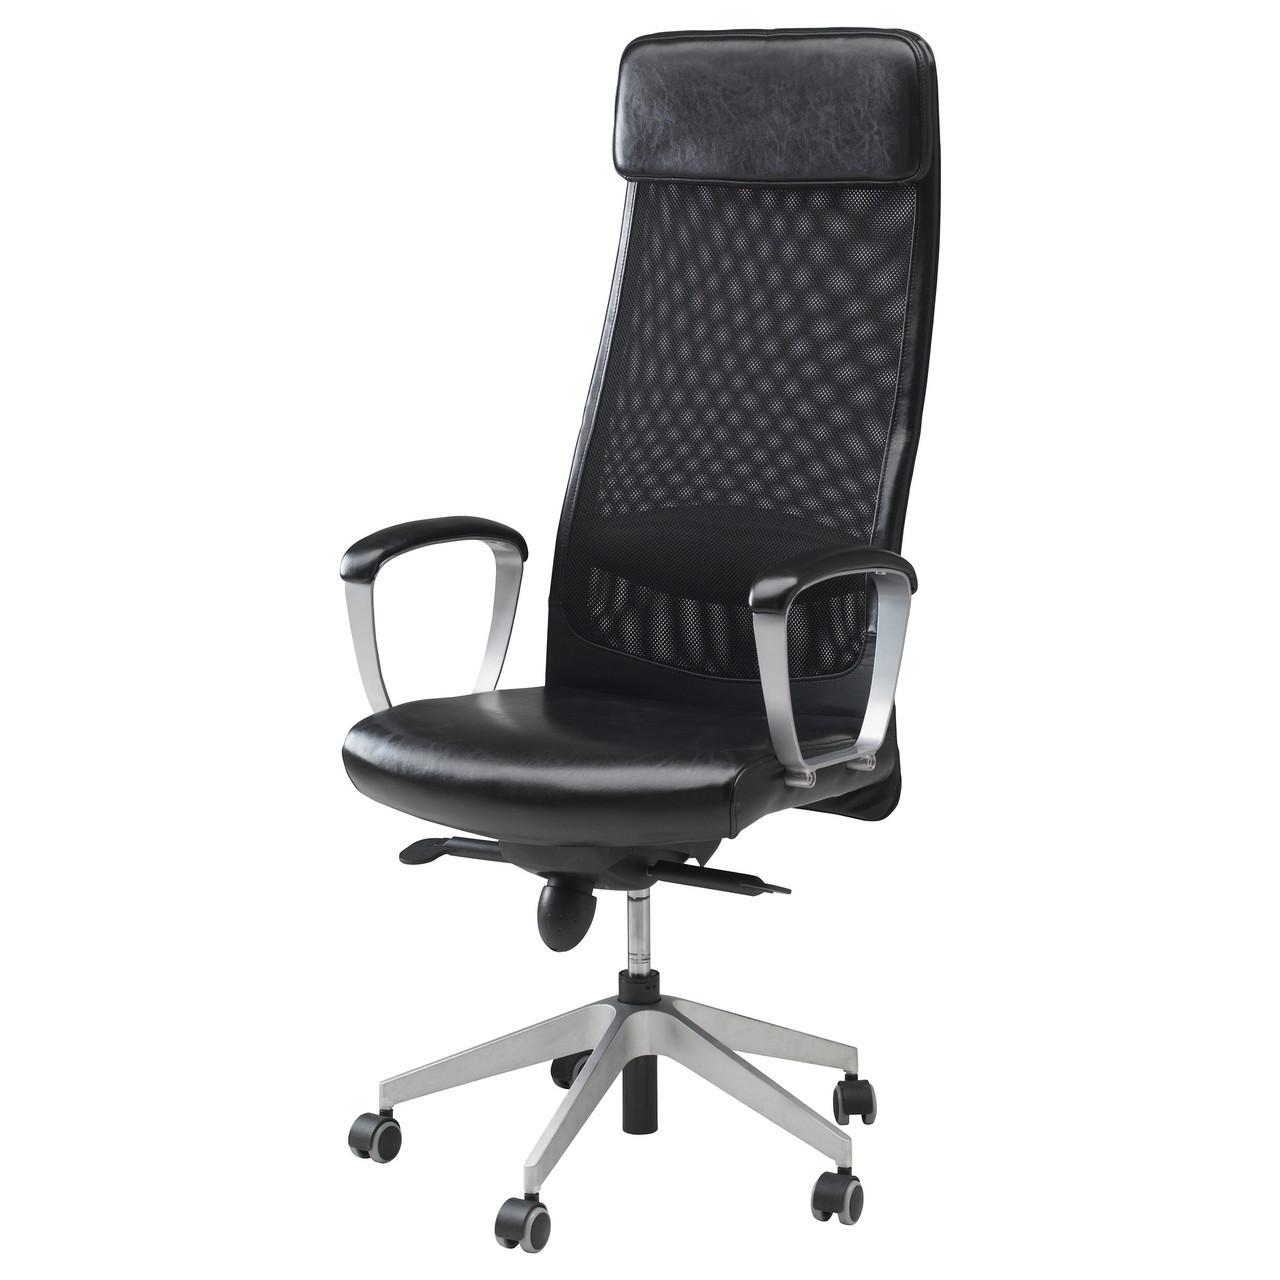 Крісло IKEA MARKUS чорне Glose Robust чорний 401.031.00